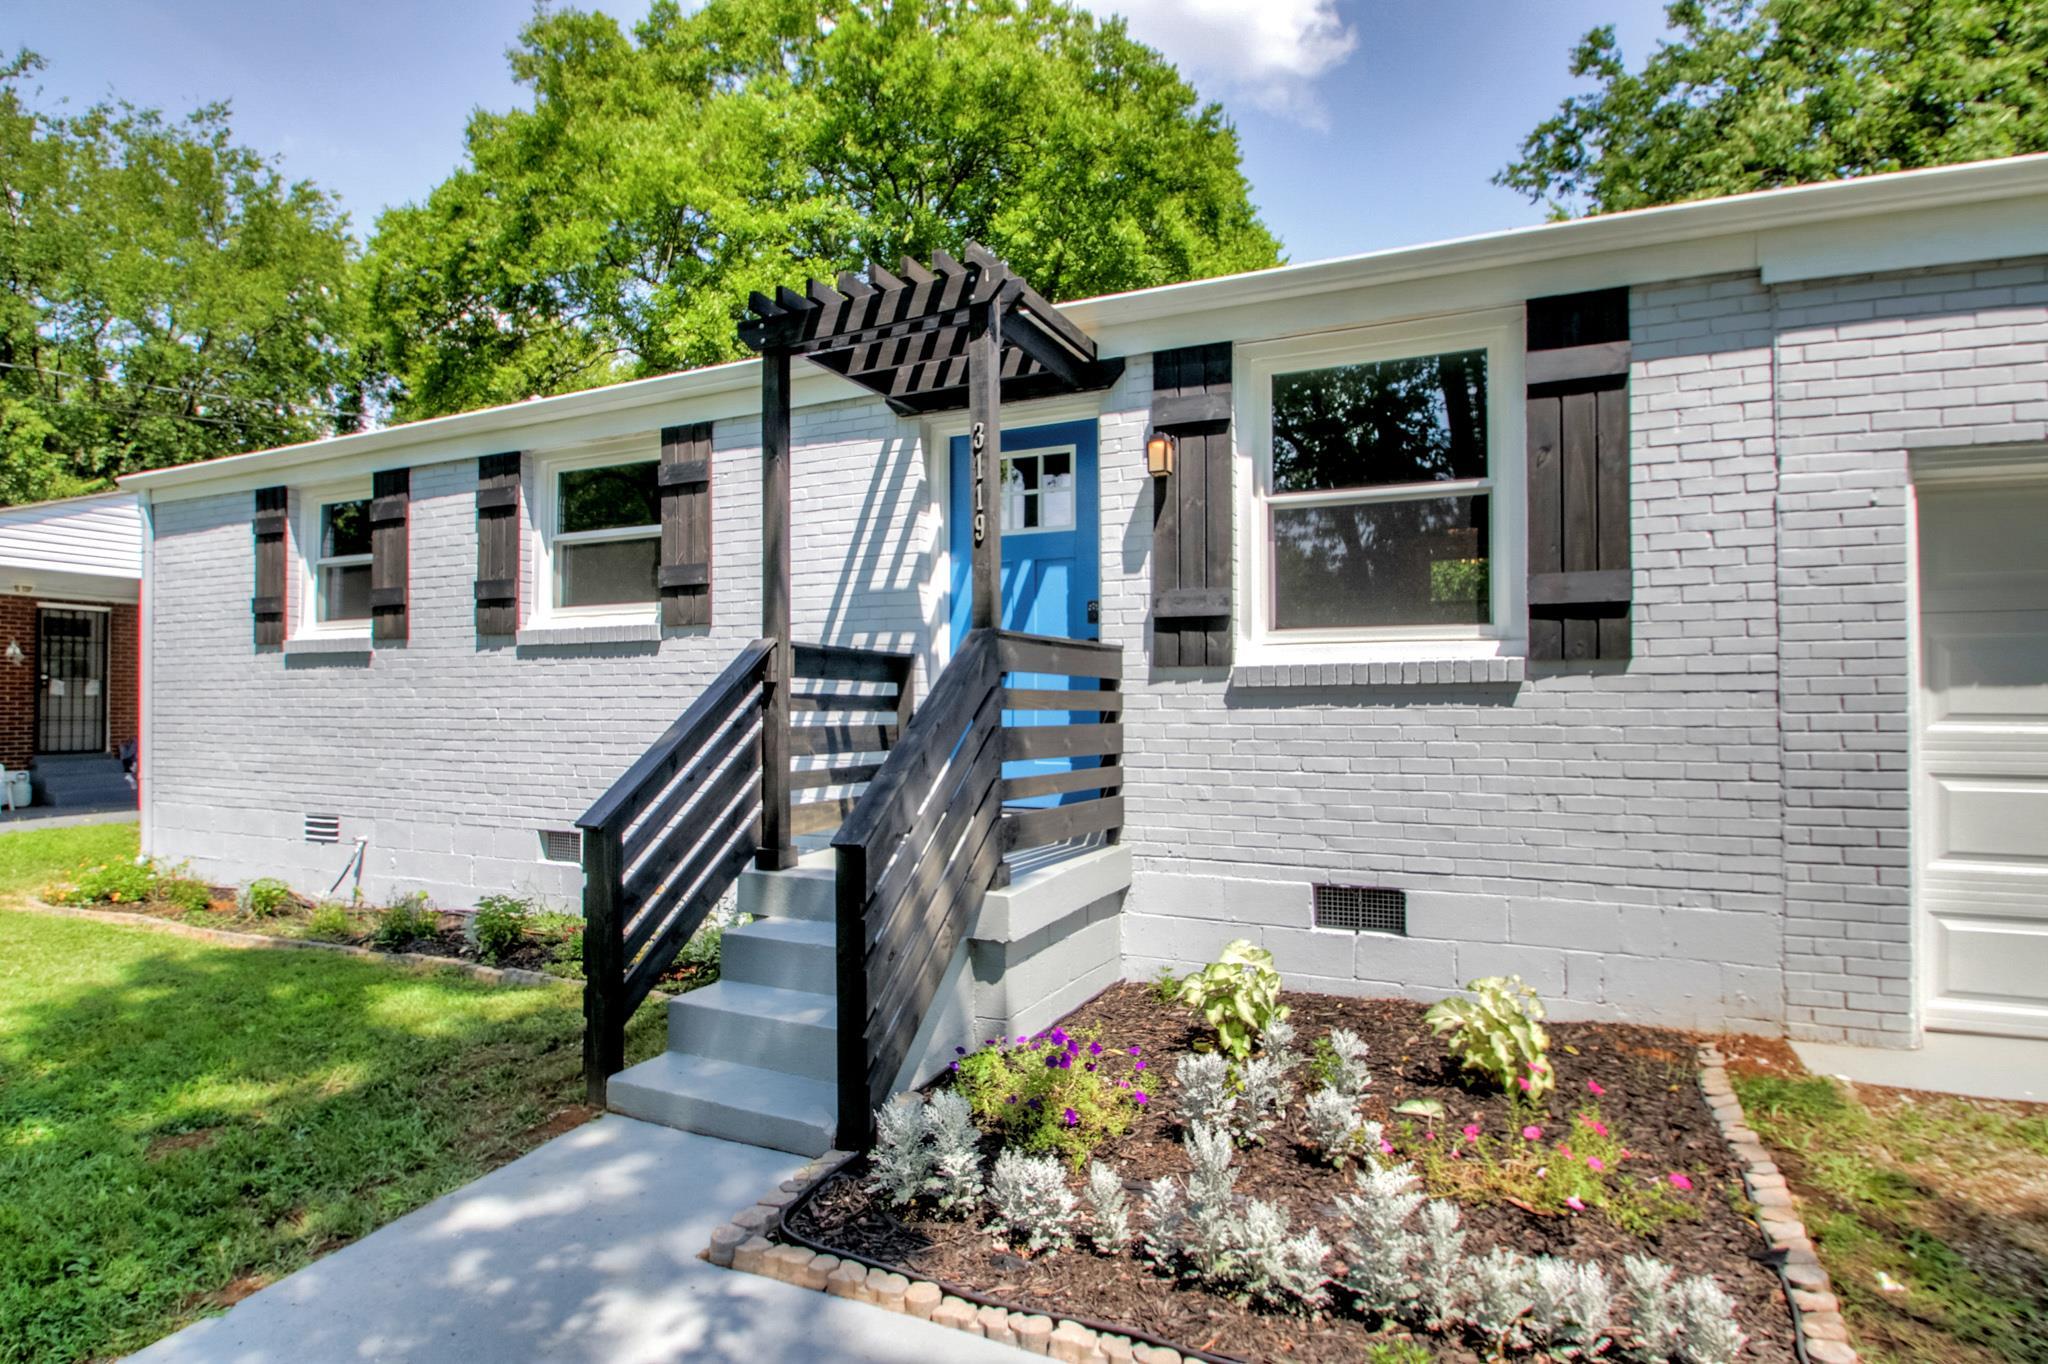 3119 Hillside Rd, Nashville, TN 37207 - Nashville, TN real estate listing